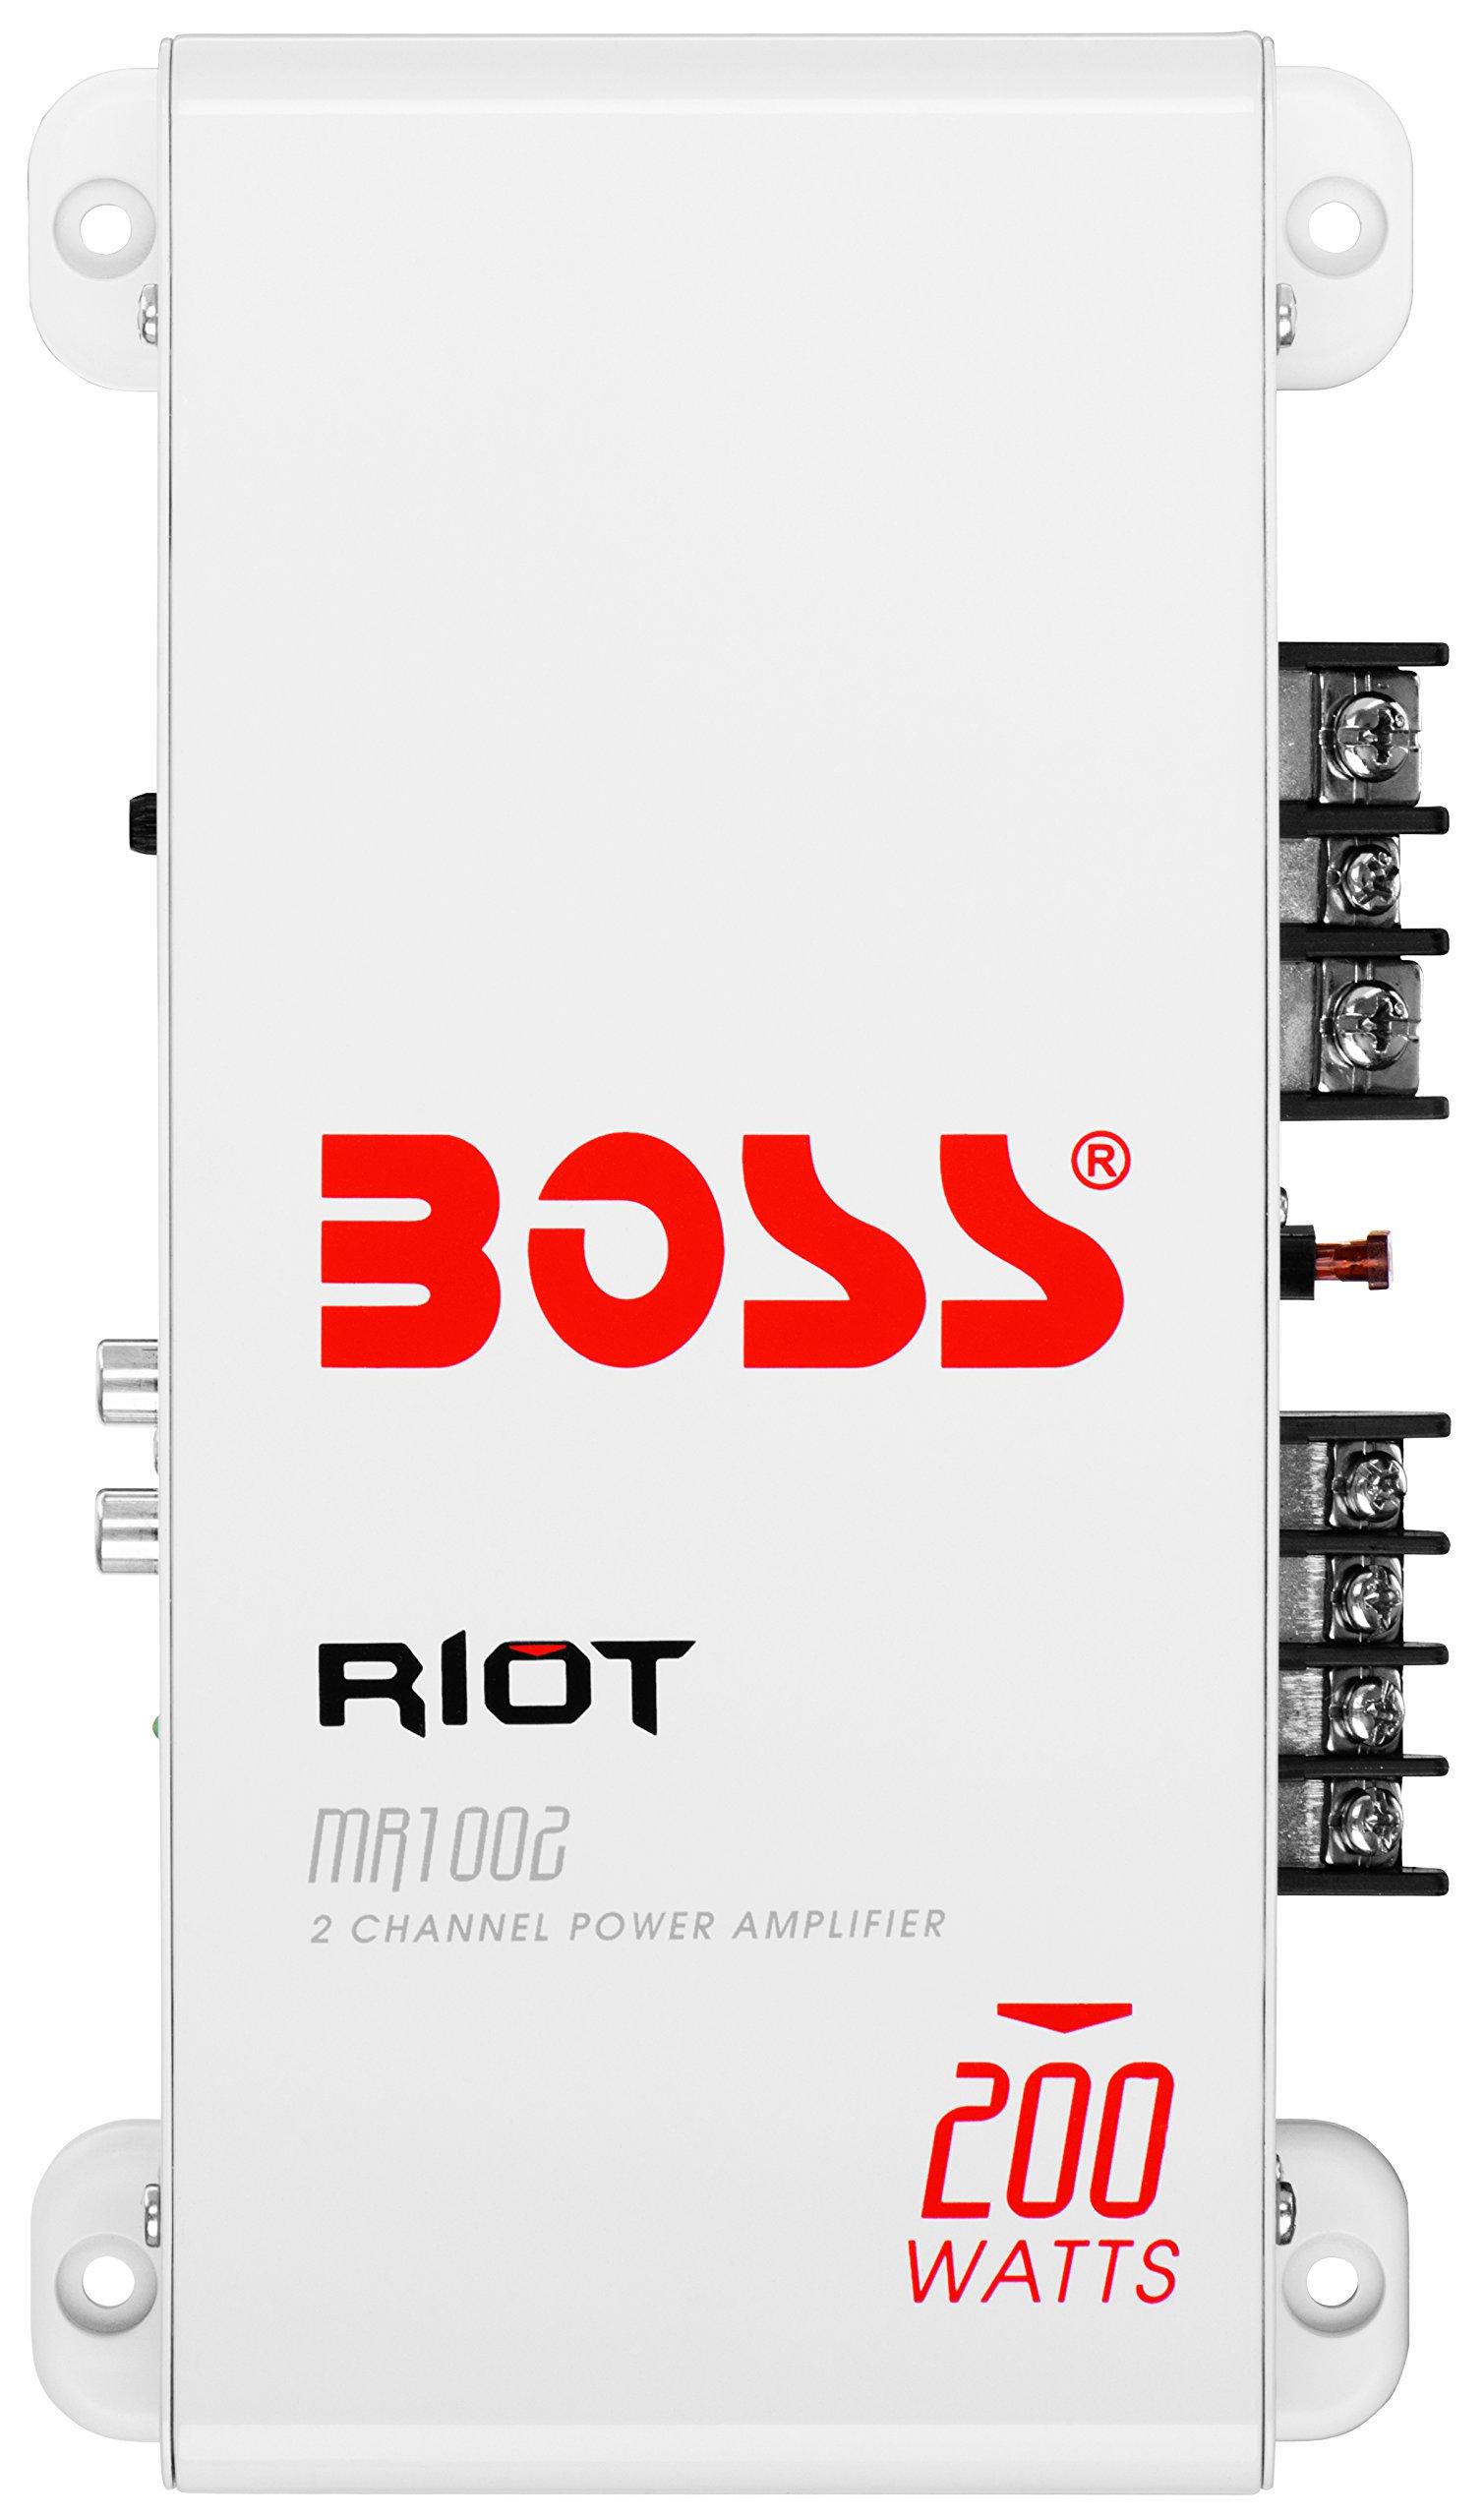 Cheap 200 Watt Audio Amplifier Find Deals Lm380 Power Circuit Get Quotations Boss Mr1002 Marine Grade 2 Channel 4 Ohm Stable